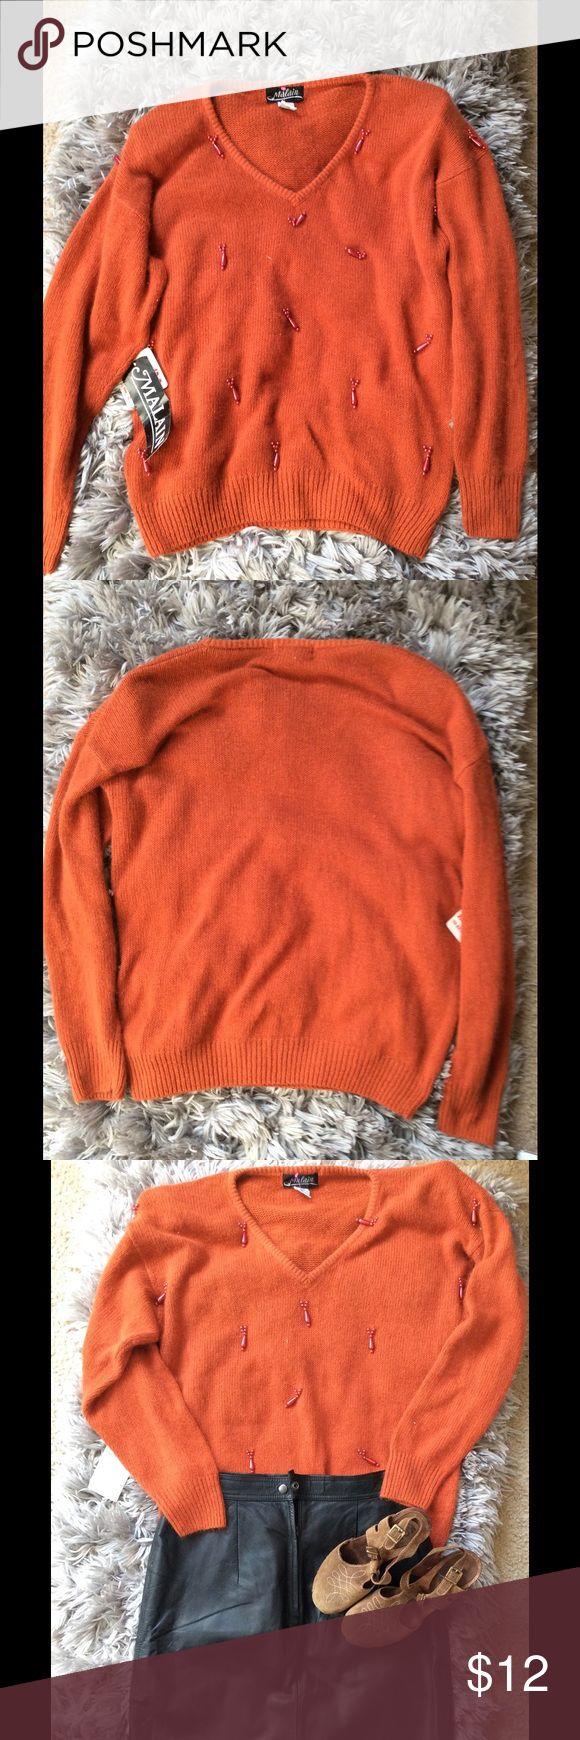 Oversized Knit Sweater Oversized knit sweater with embellishments Malain Sweaters V-Necks